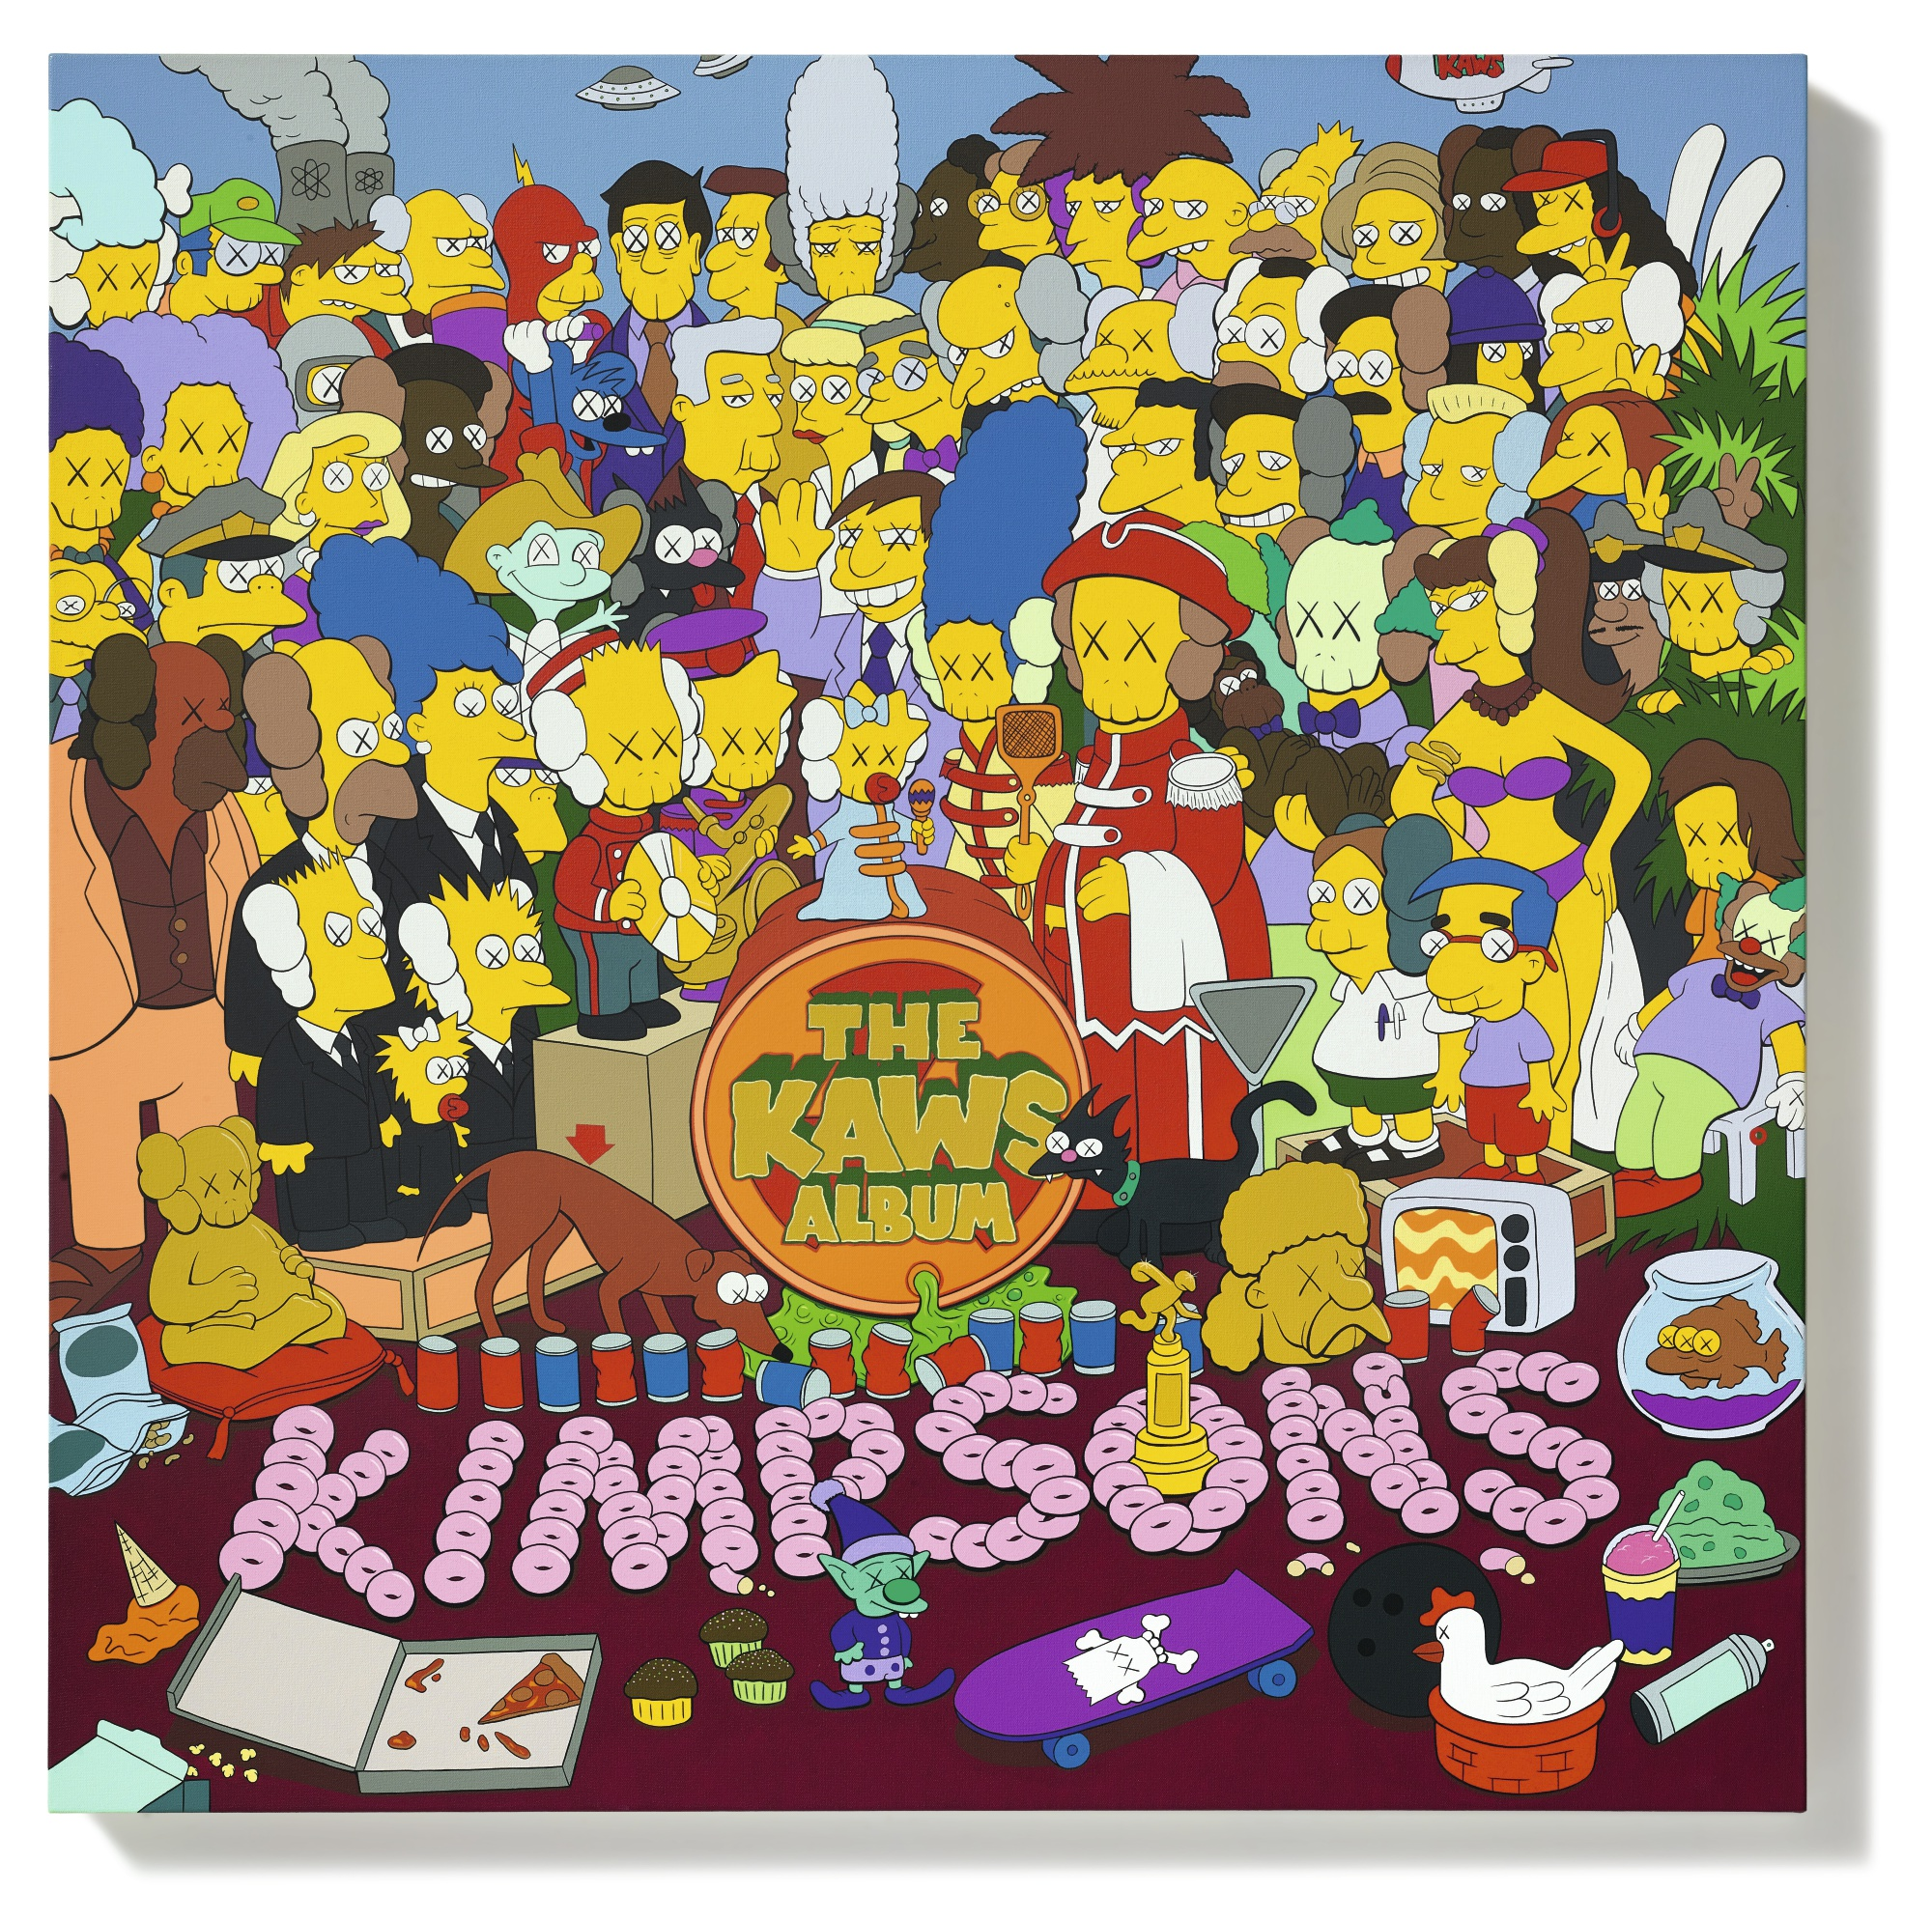 KAWS made $14 million from Bill Morrison art, and Morrison